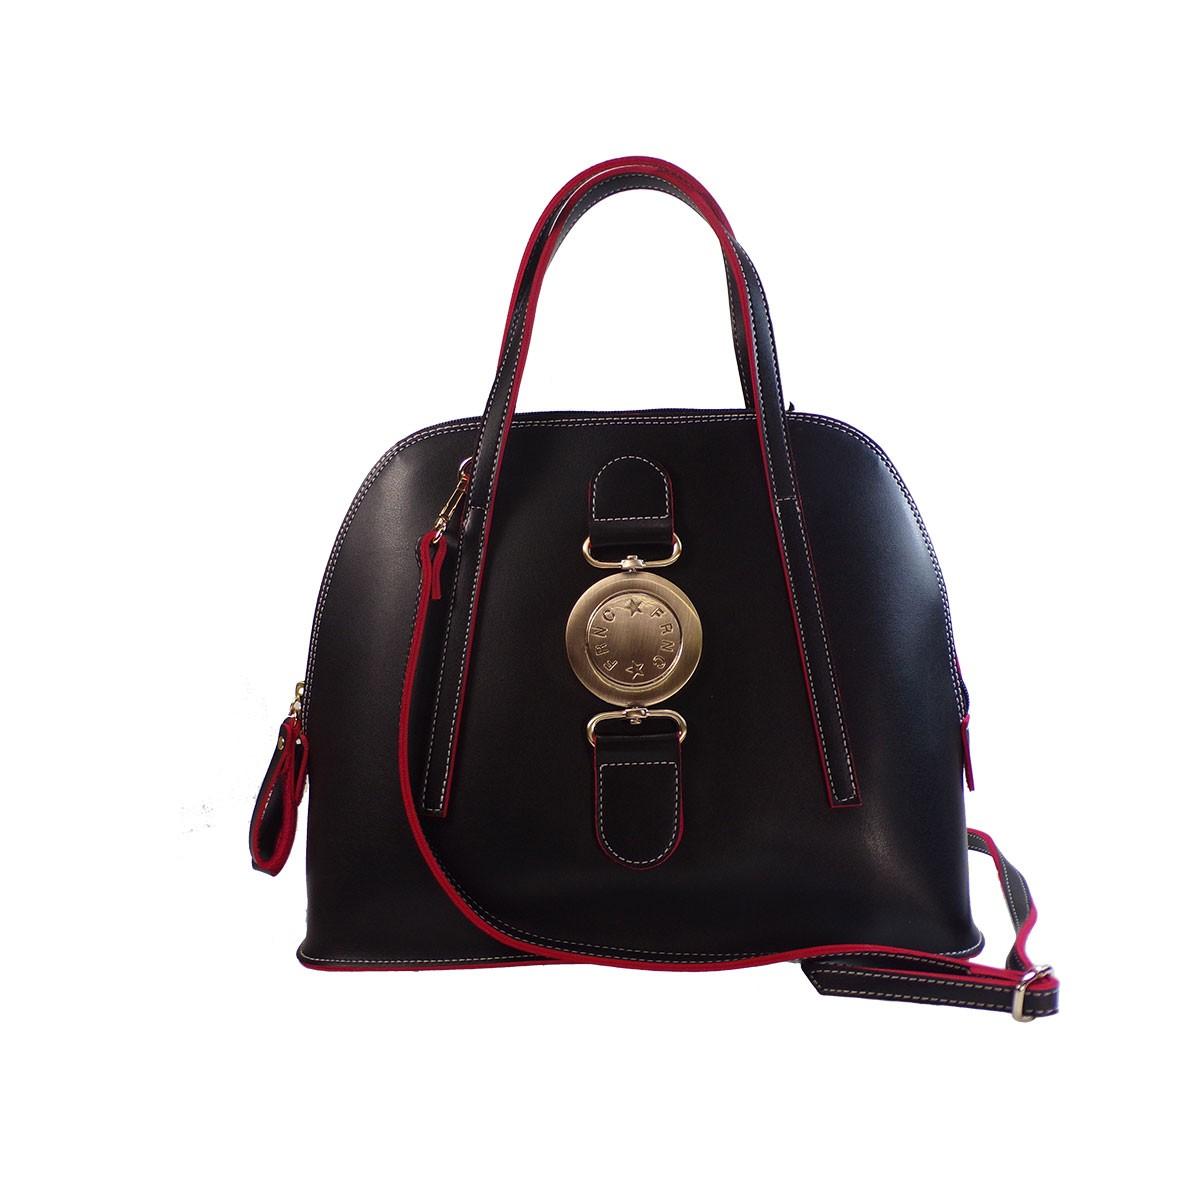 120625d365 FRNC FRANCESCO Τσάντα Γυναικεία Ώμου 571 Μαύρο Δέρμα – IShoeStore